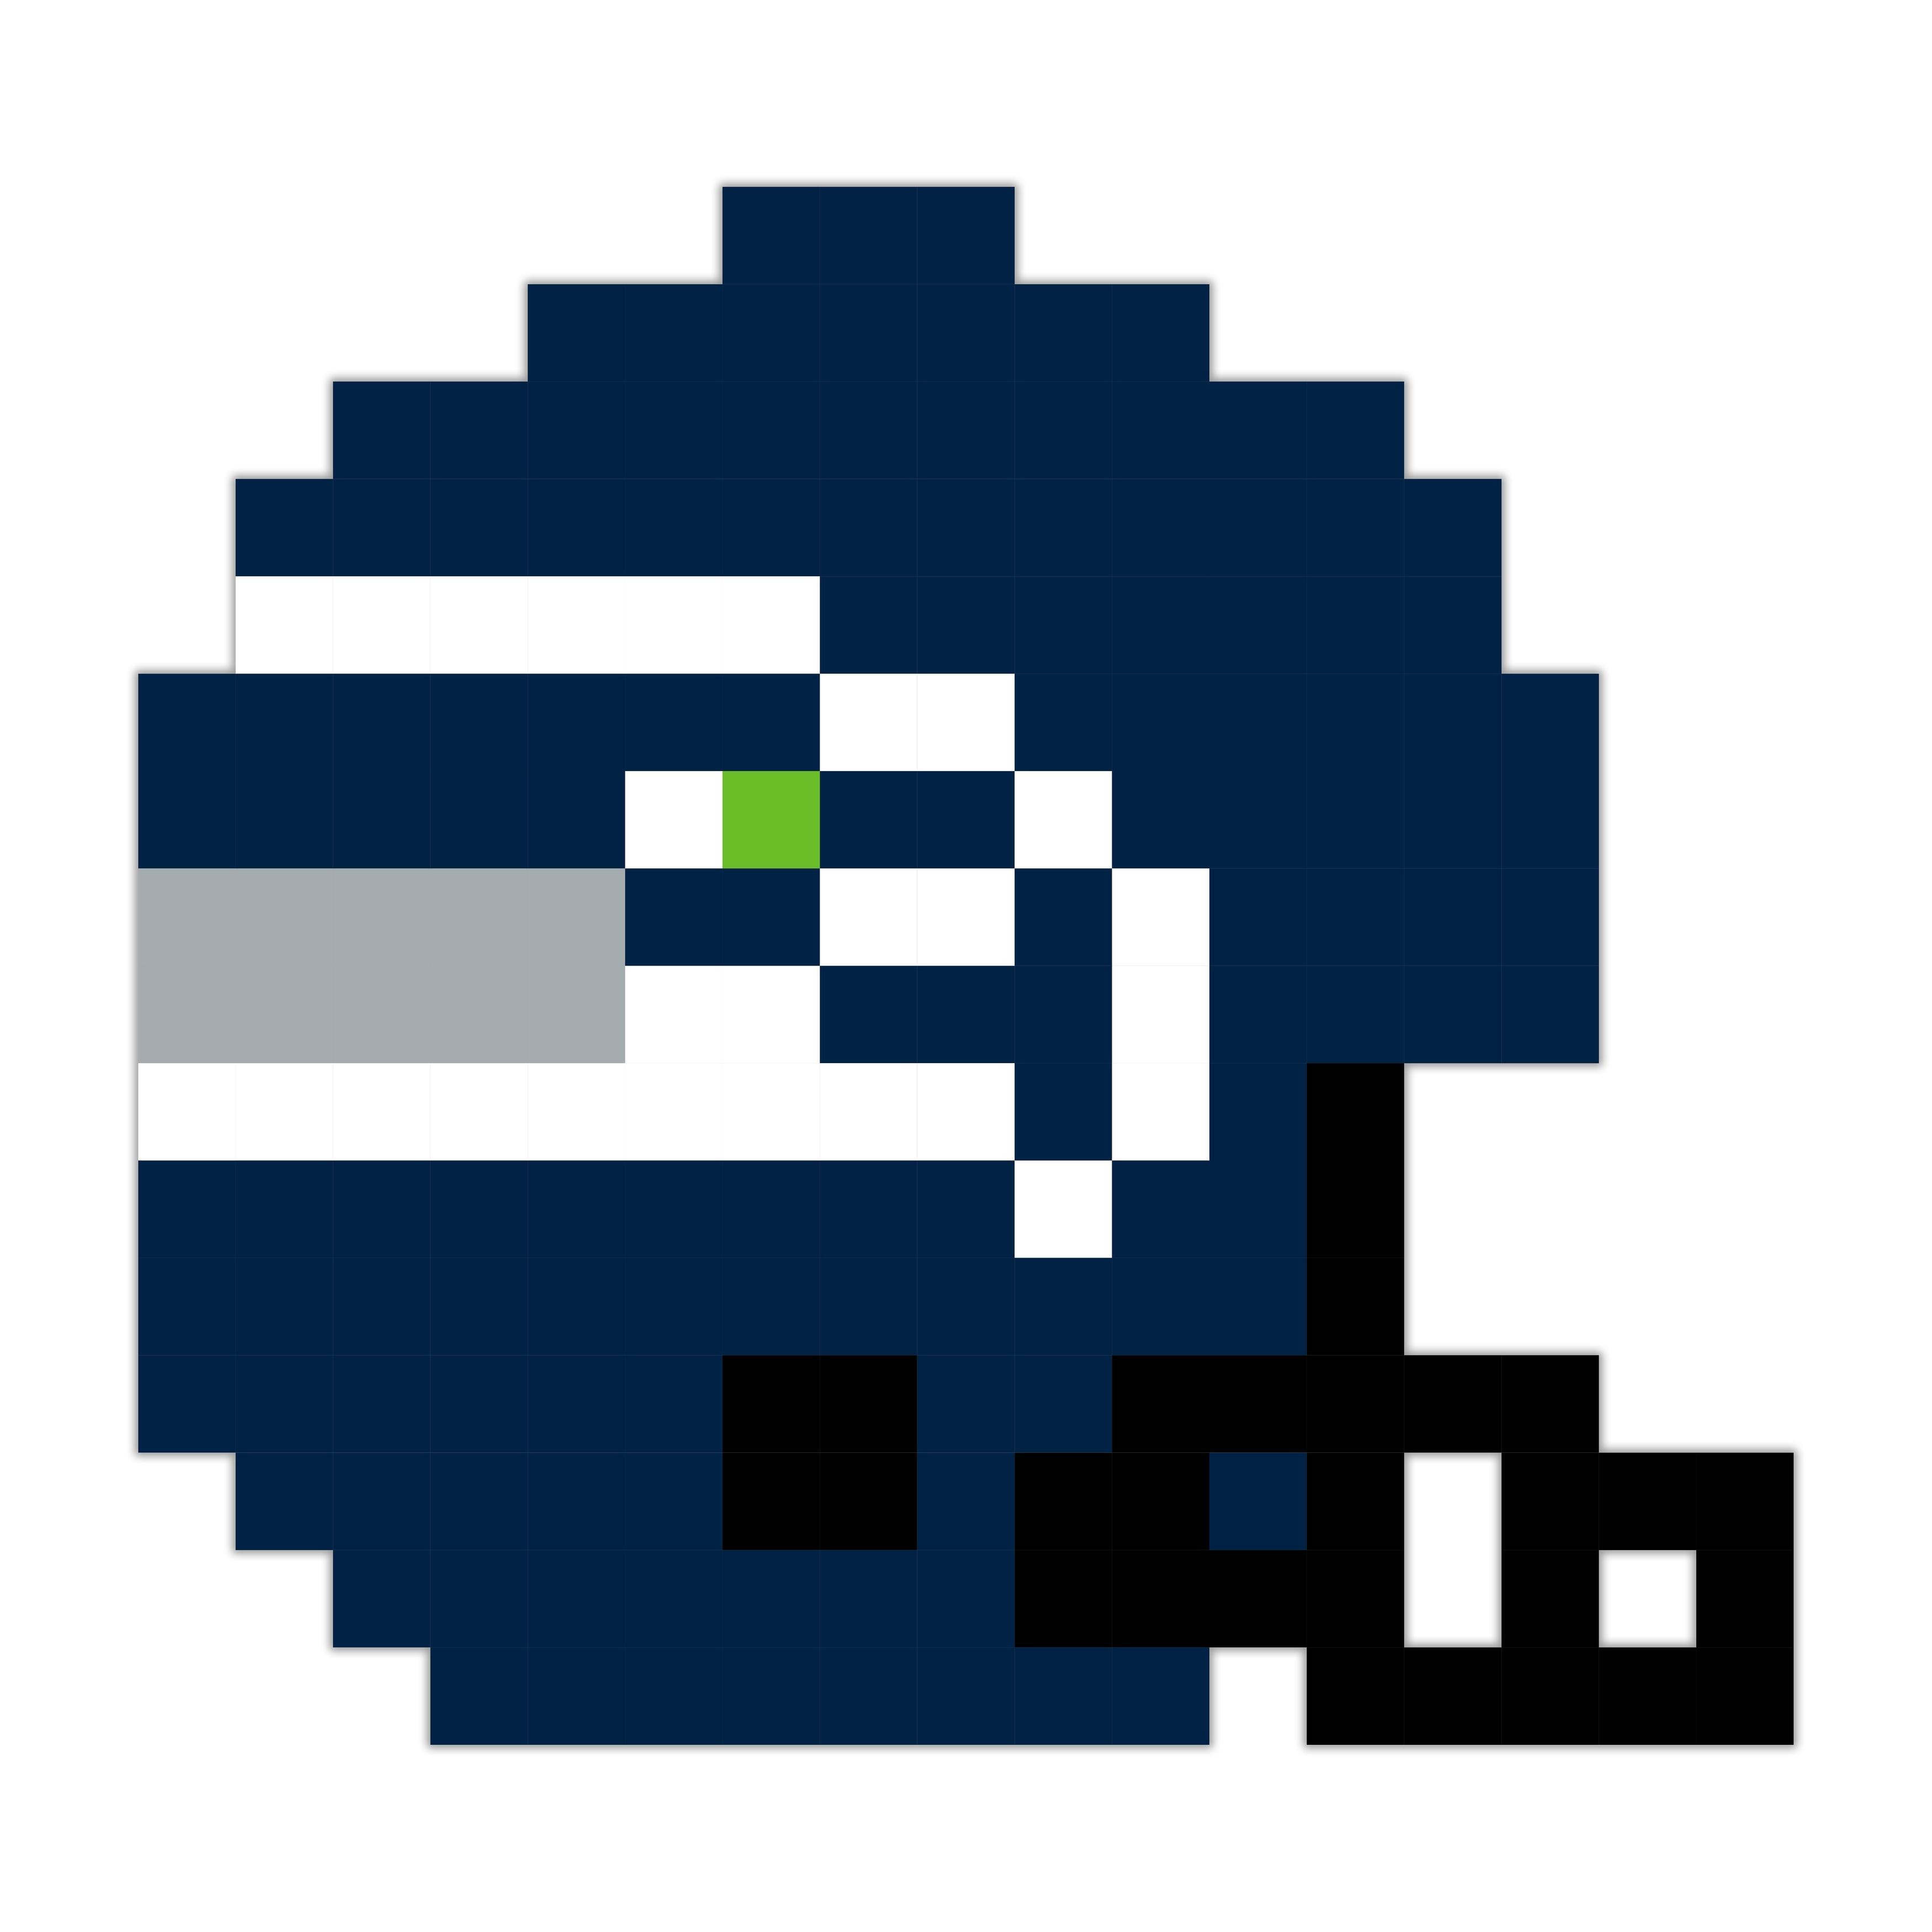 Seattle Football Helmet Pixel Art 6x6 Peelnstick Wall Art